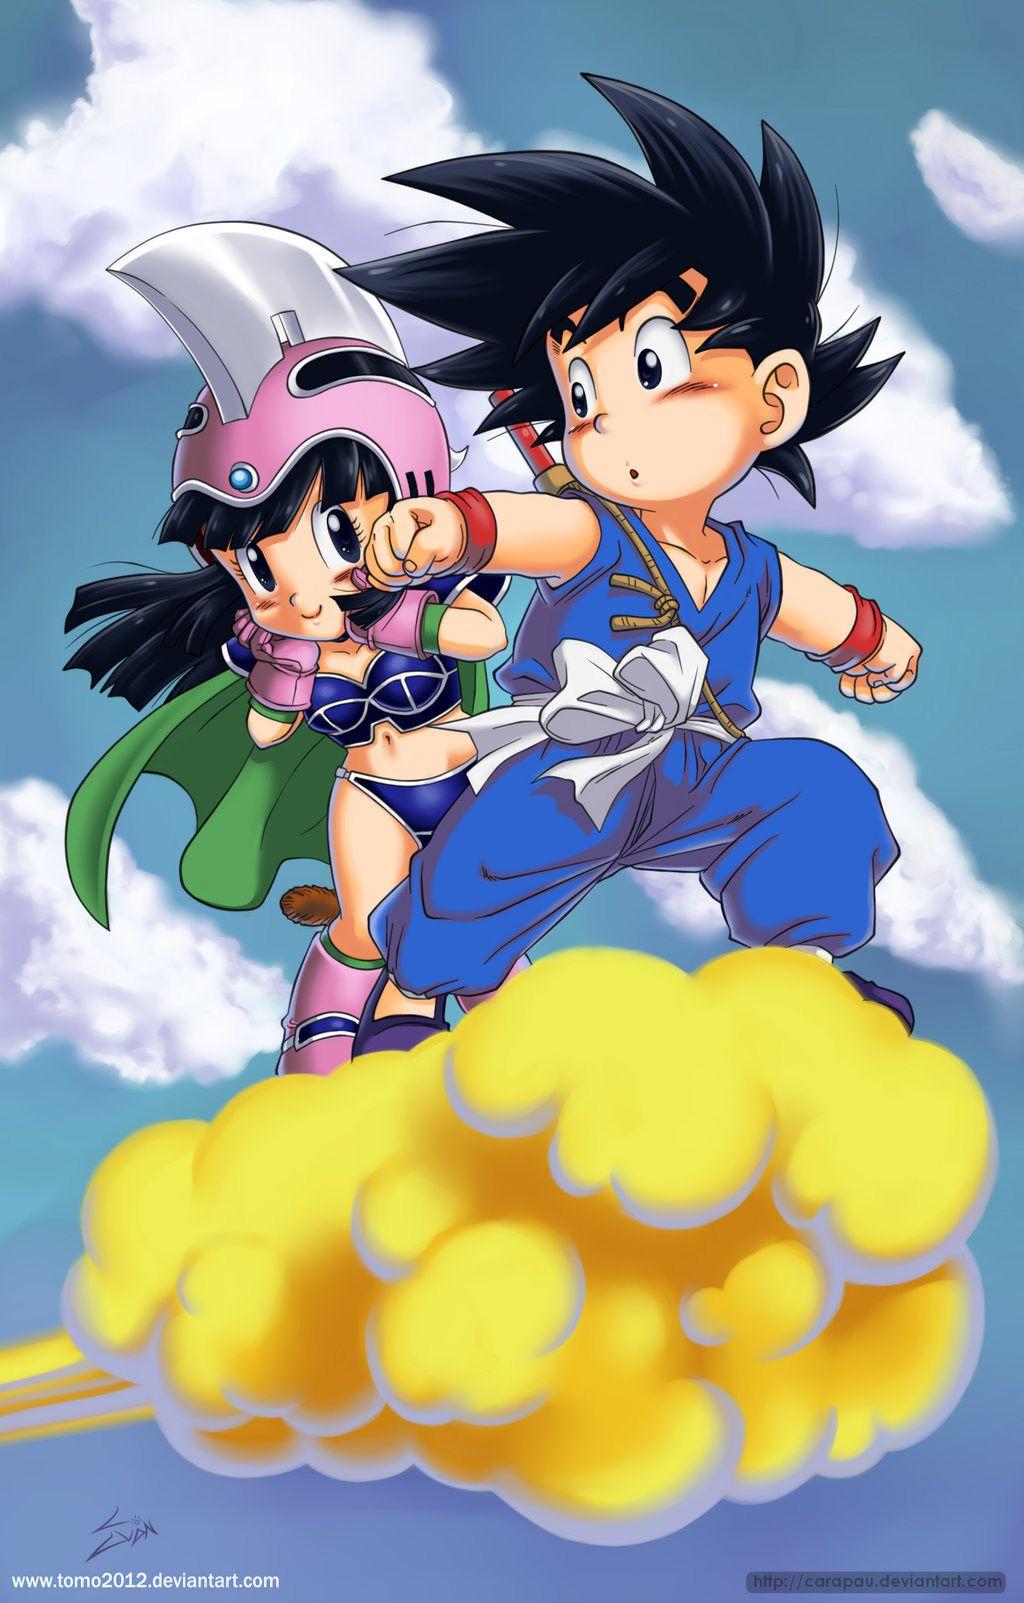 Goku x Milk de niños | lindo | Dragon ball, Goku y Dragon ...